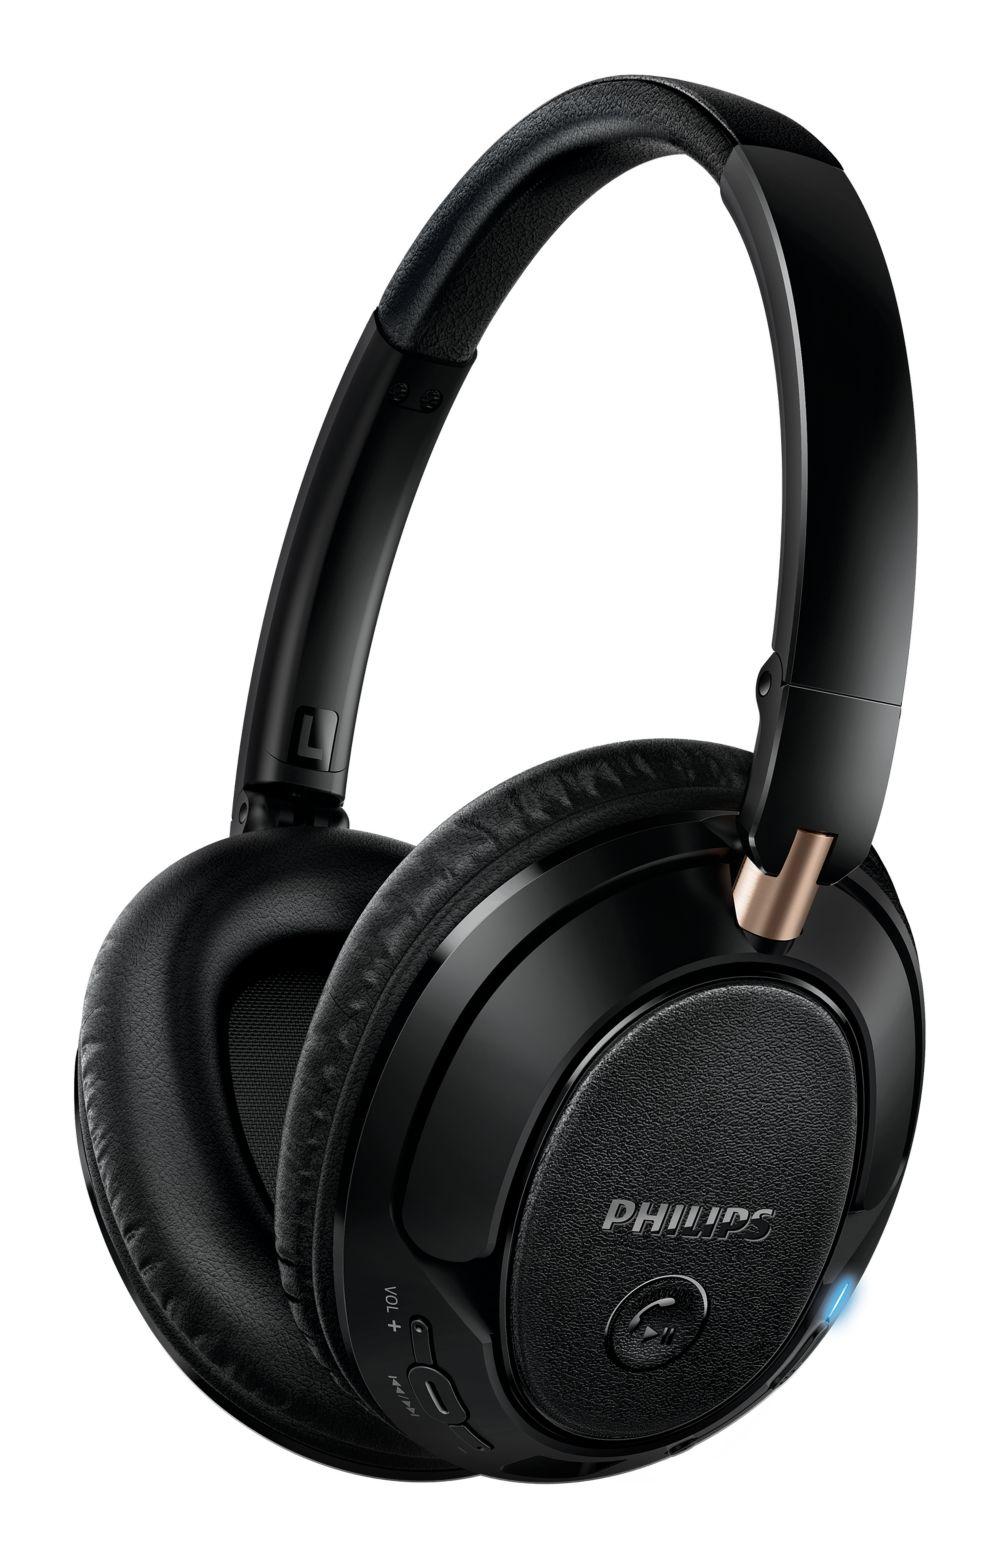 Image of Philips SHB7250